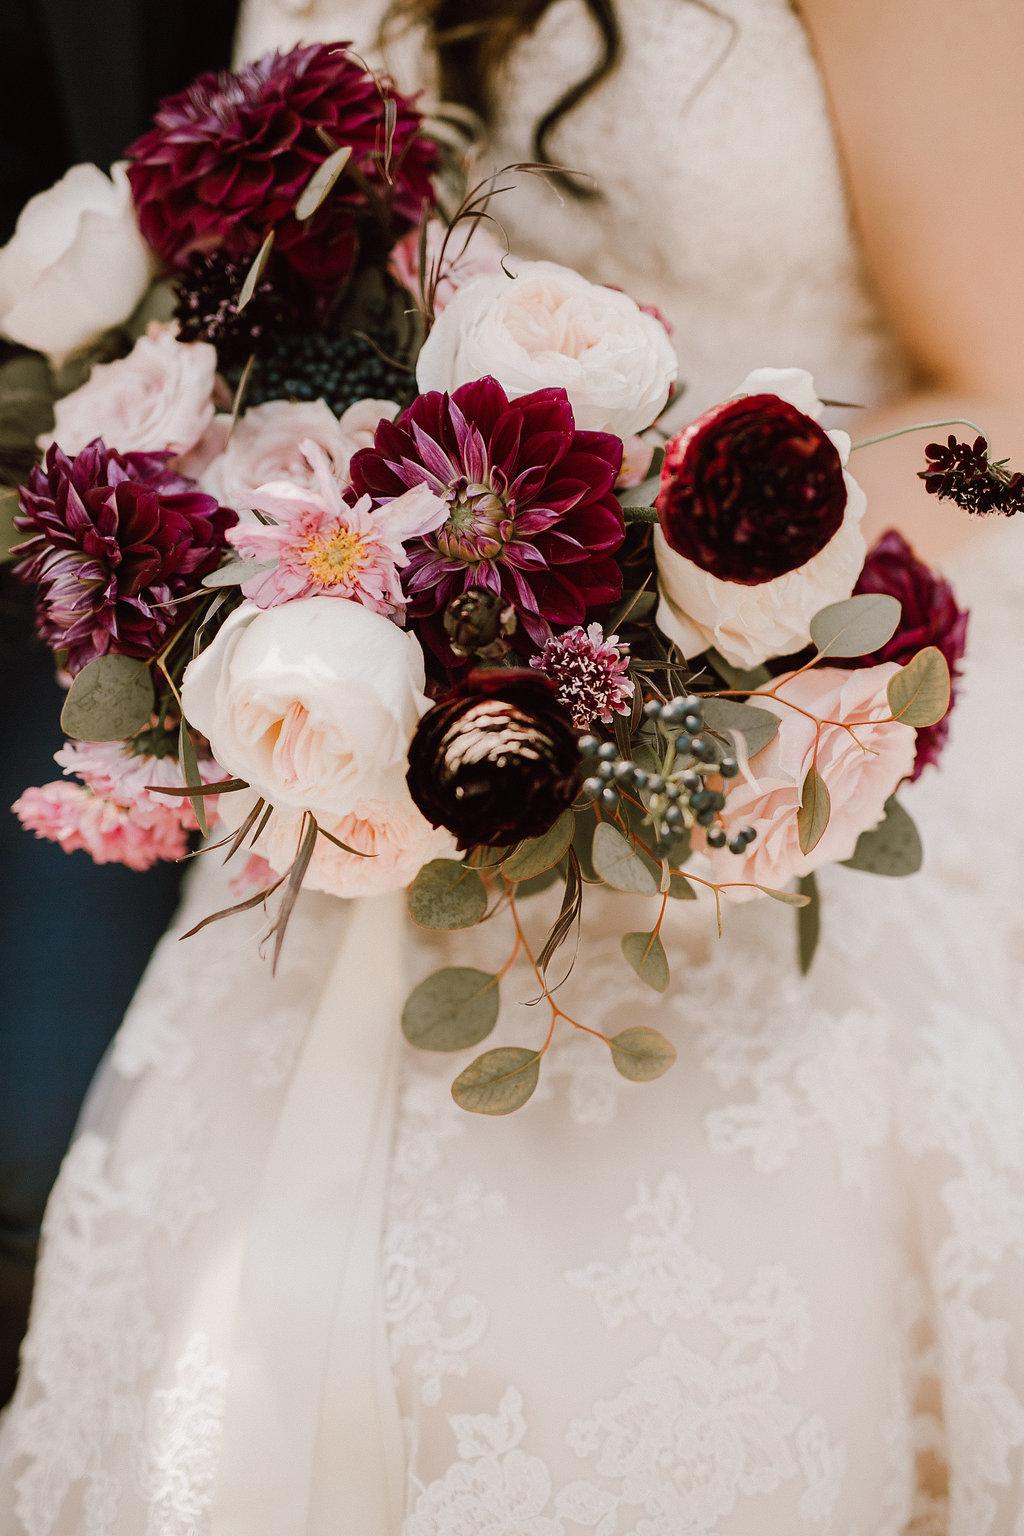 Peach and Plum Bridal Bouquet - STone House Creative